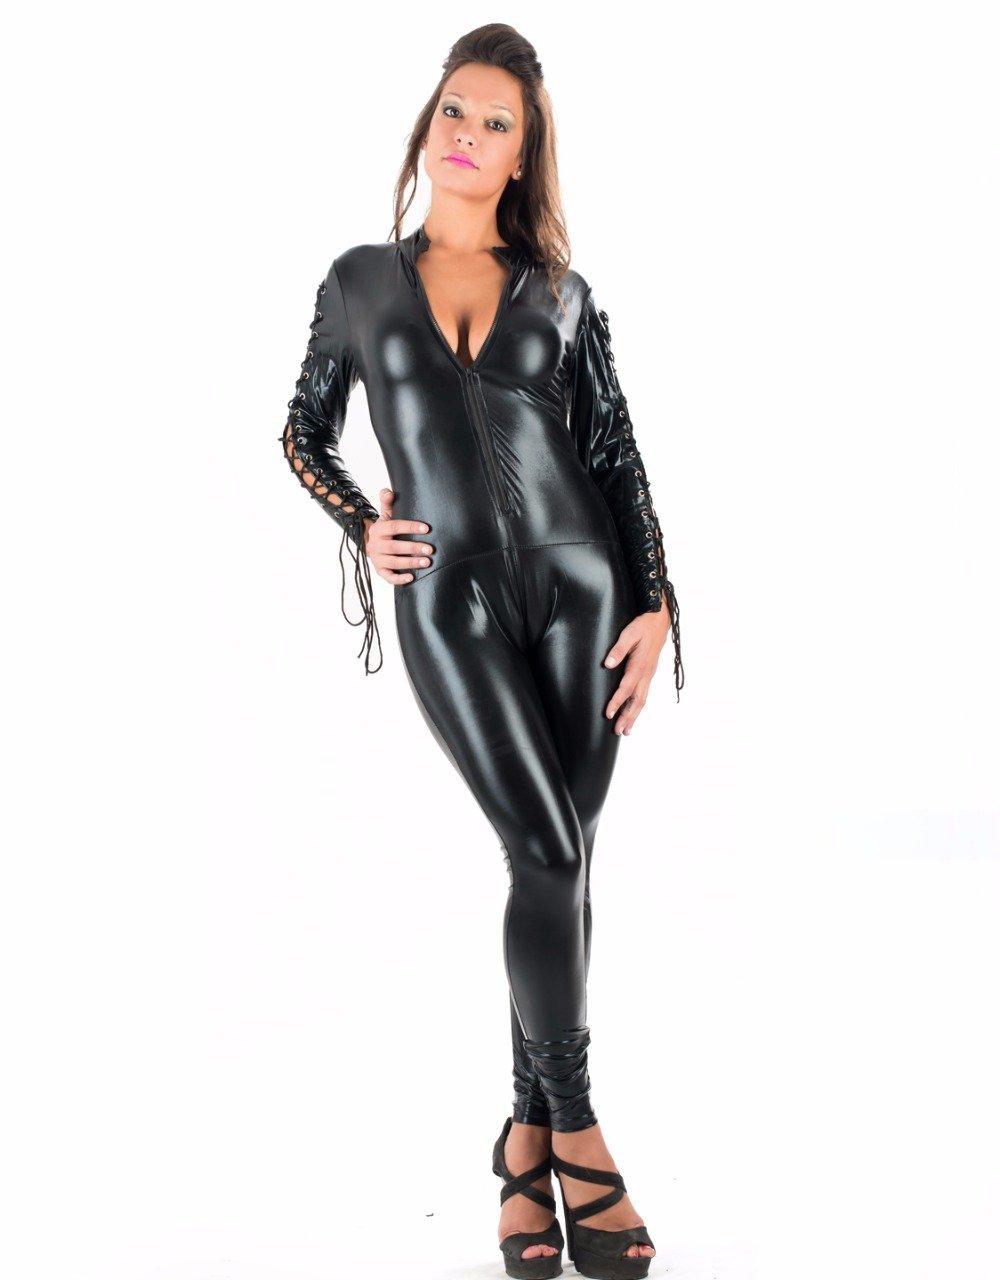 Erotic Wet Look Vinyl Jumpsuit Bodysuit Long Sleeve Zipper To Crotch Open Bra Unitard Adult Black Ca